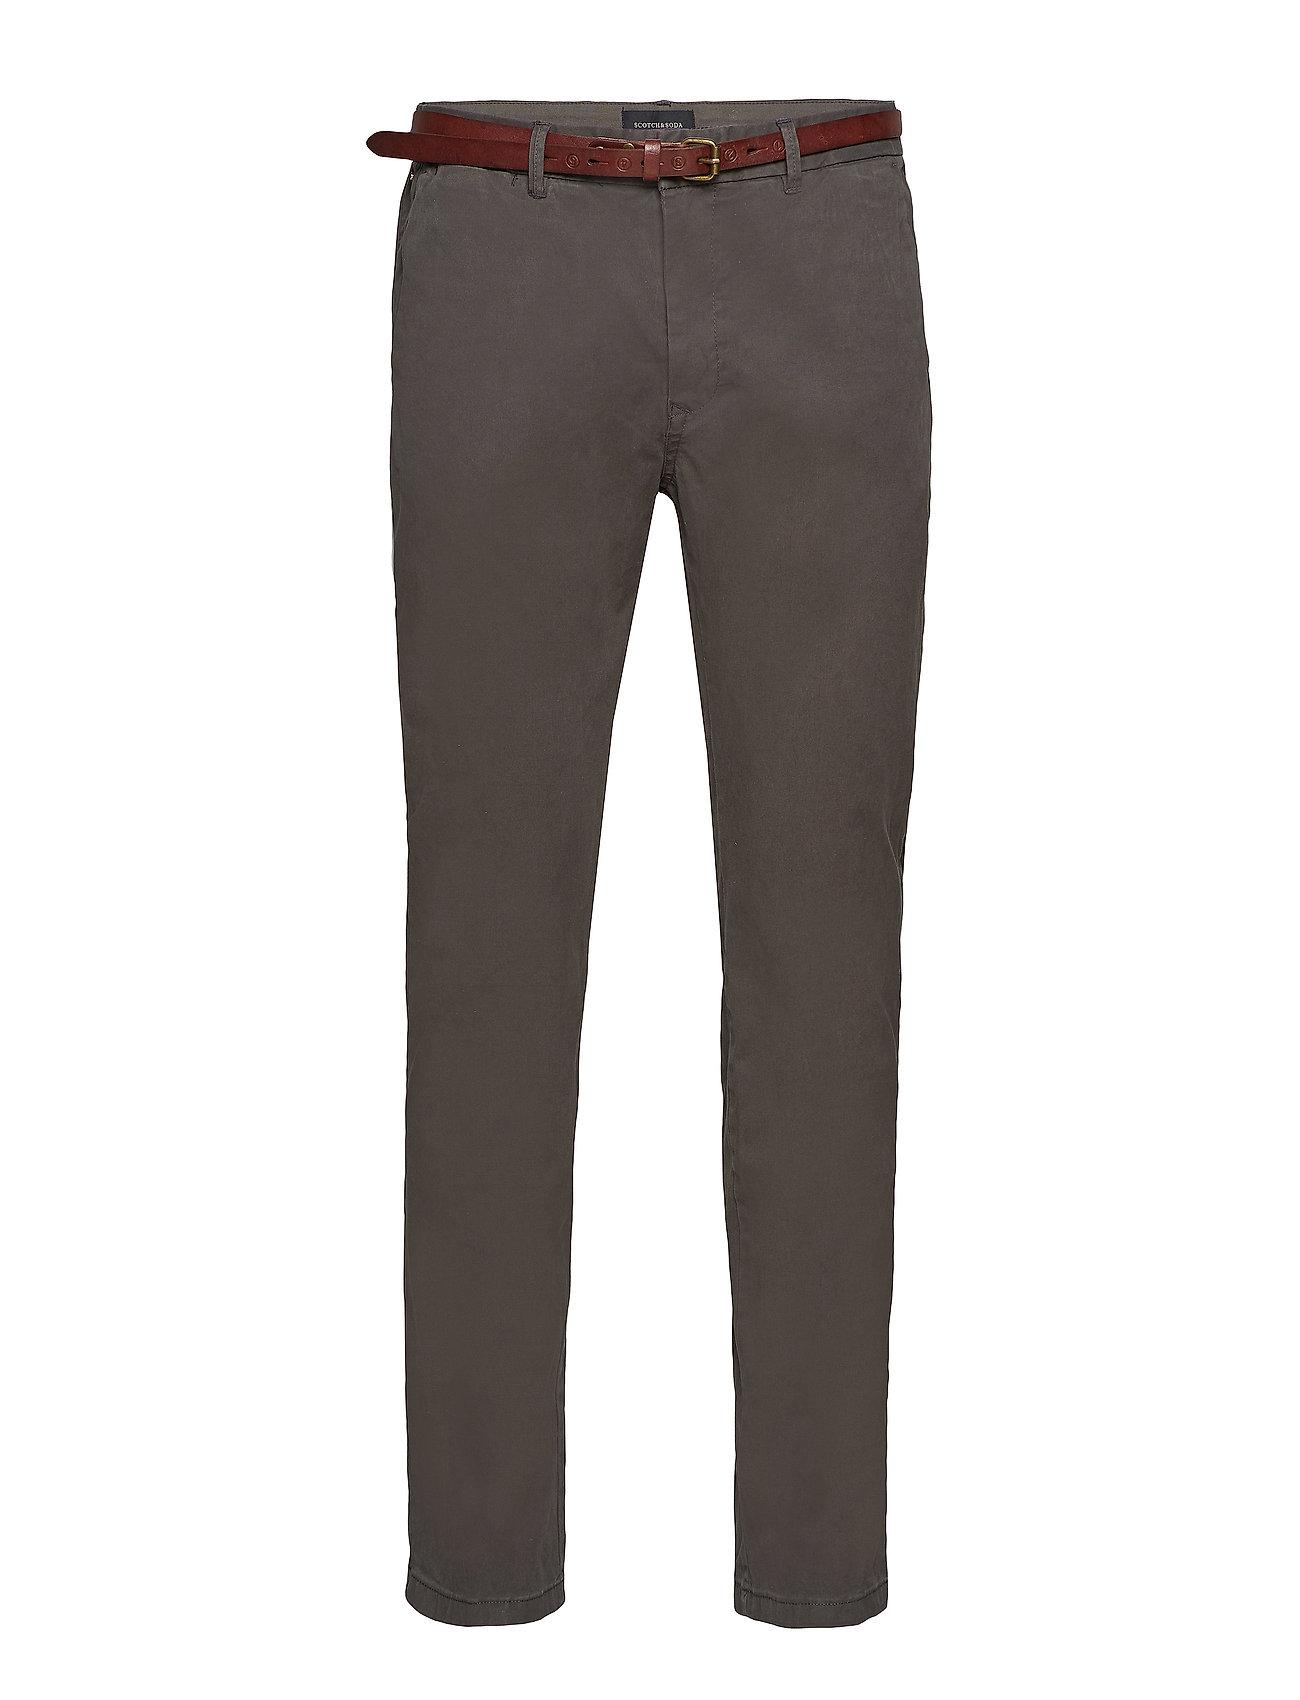 Scotch & Soda Slim fit cotton/elastan garment dyed chino pant - CHARCOAL